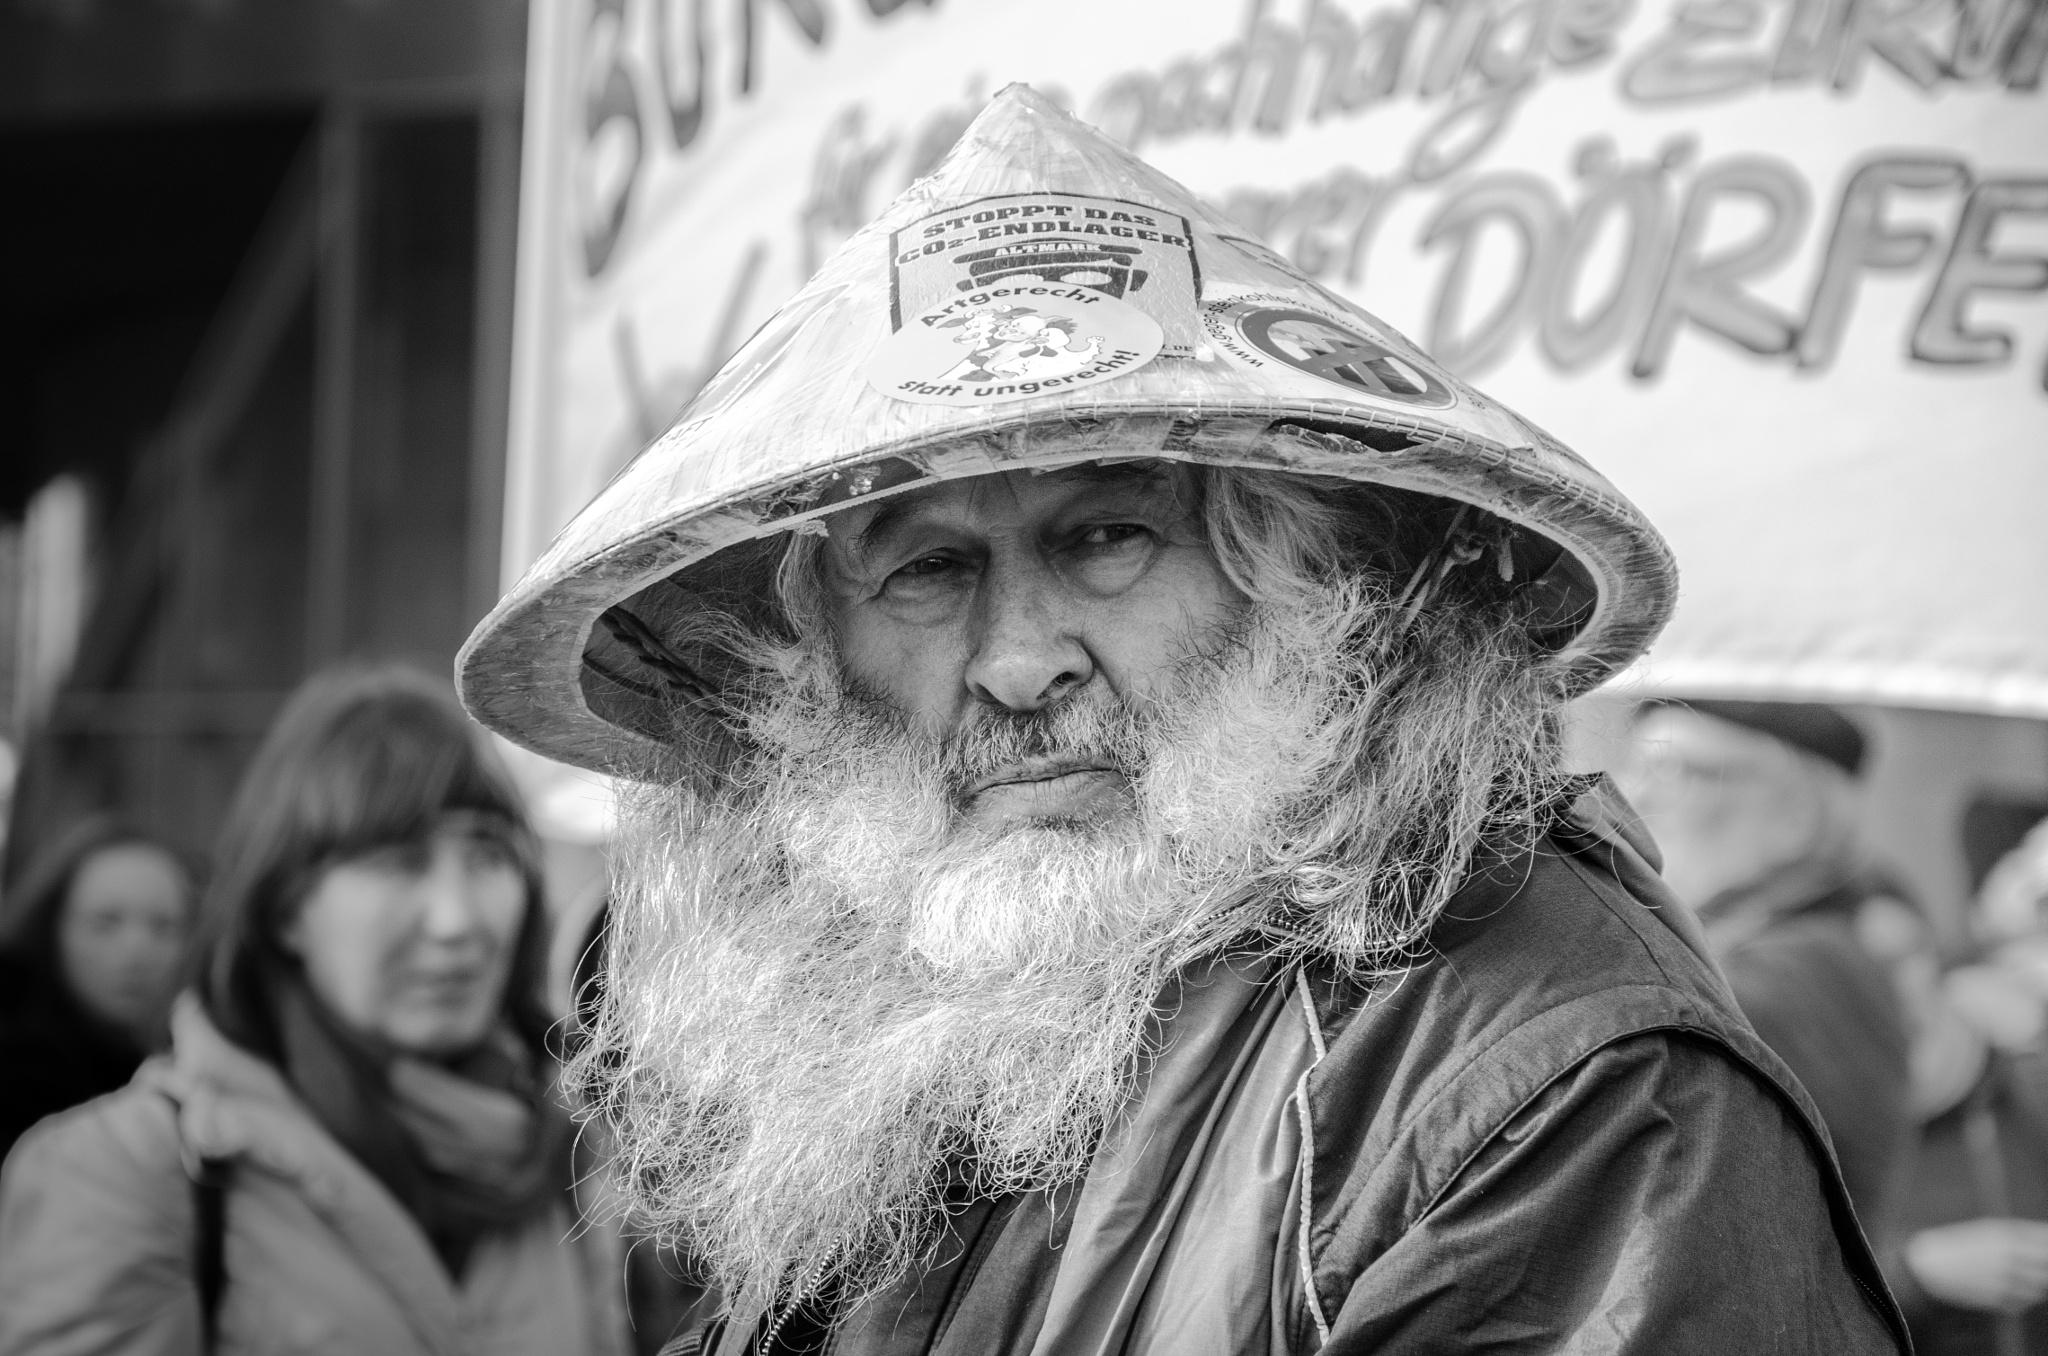 Demonstrator by Marianne Drews